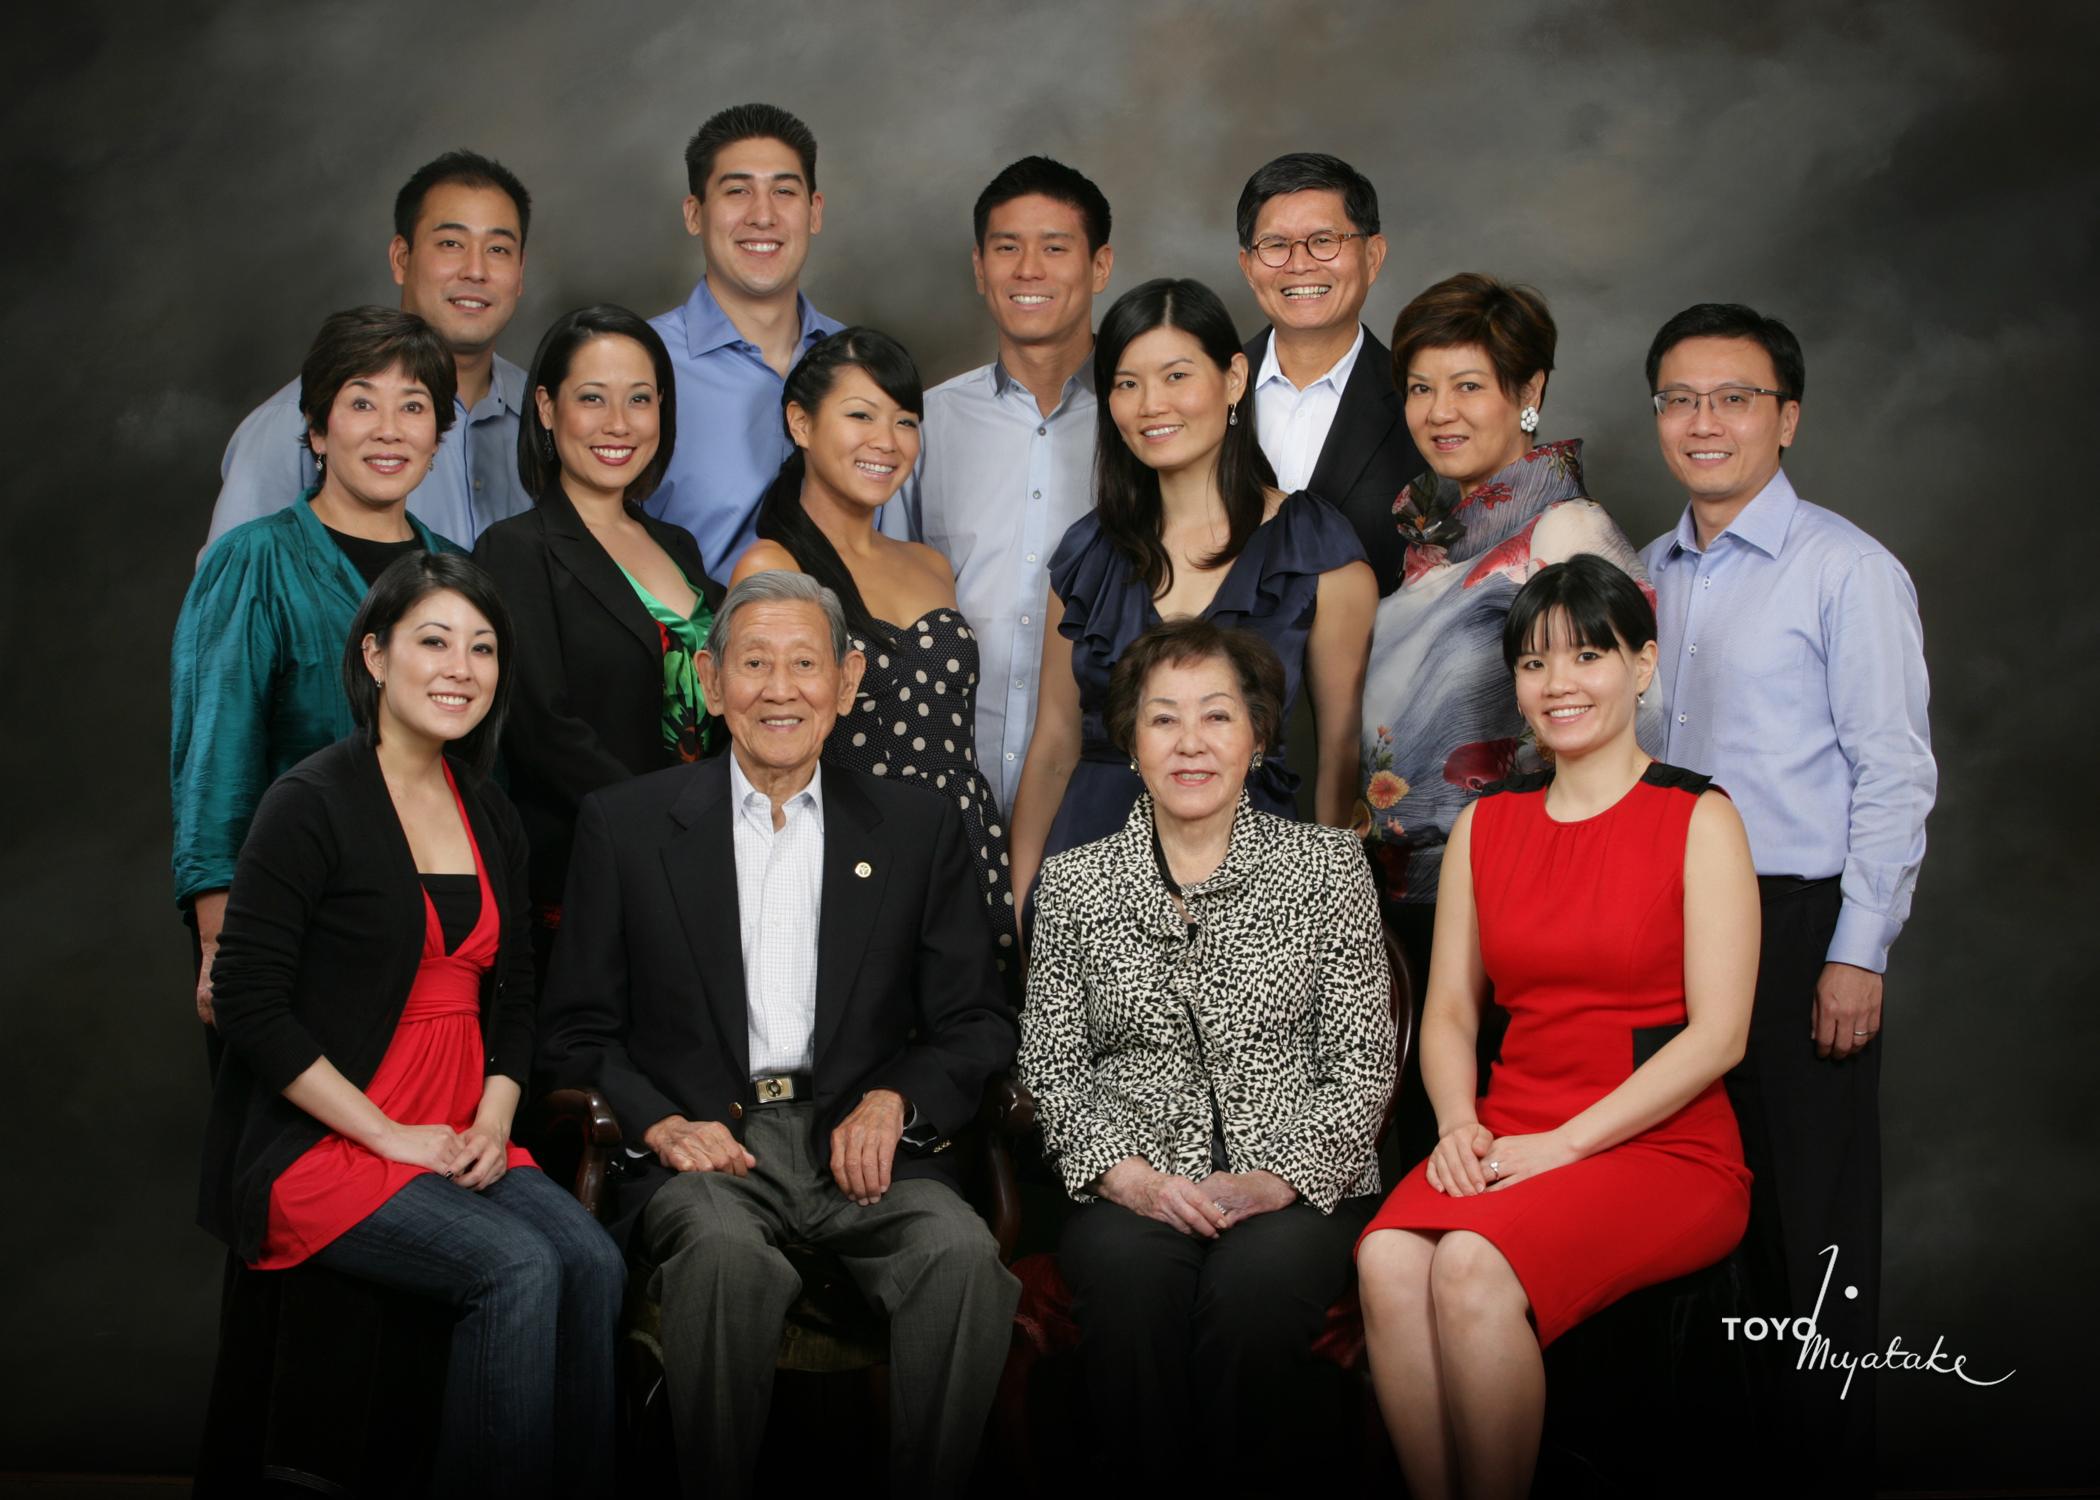 Aratani Family.Toyo Miyatake.jpg